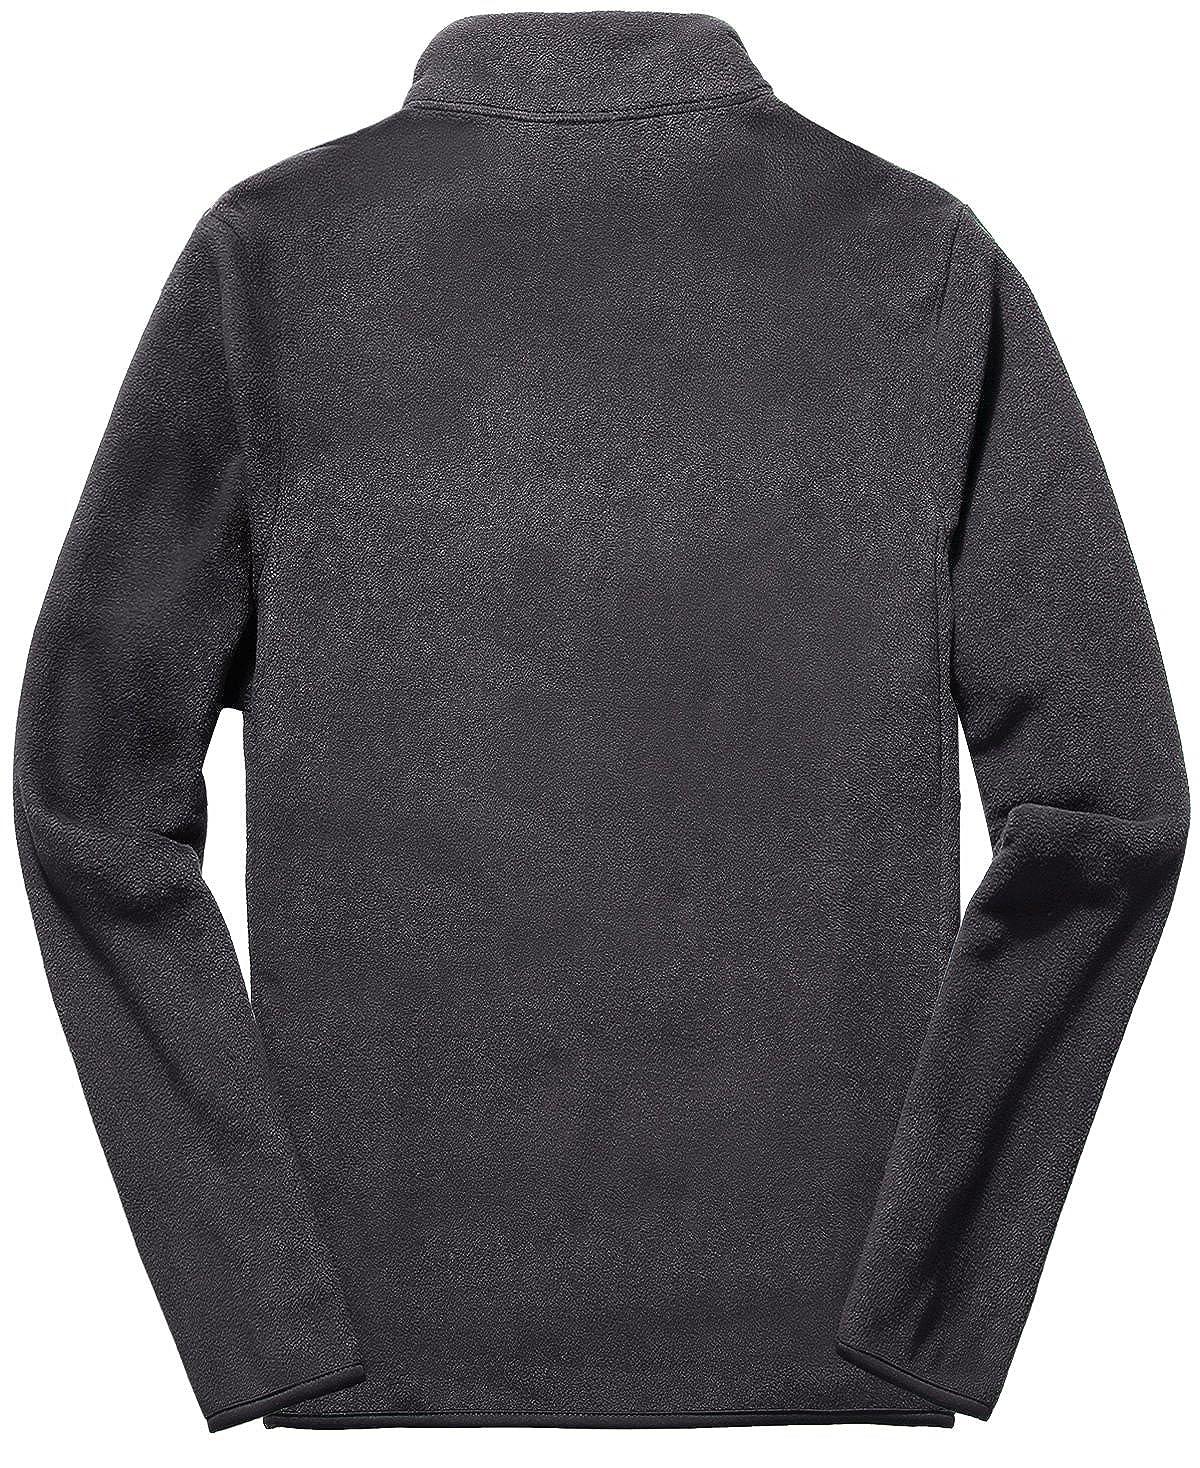 Fastorm Mens Lightweight Fleece Jacket Zipper Sweatshirt Polar Fleece Jacket